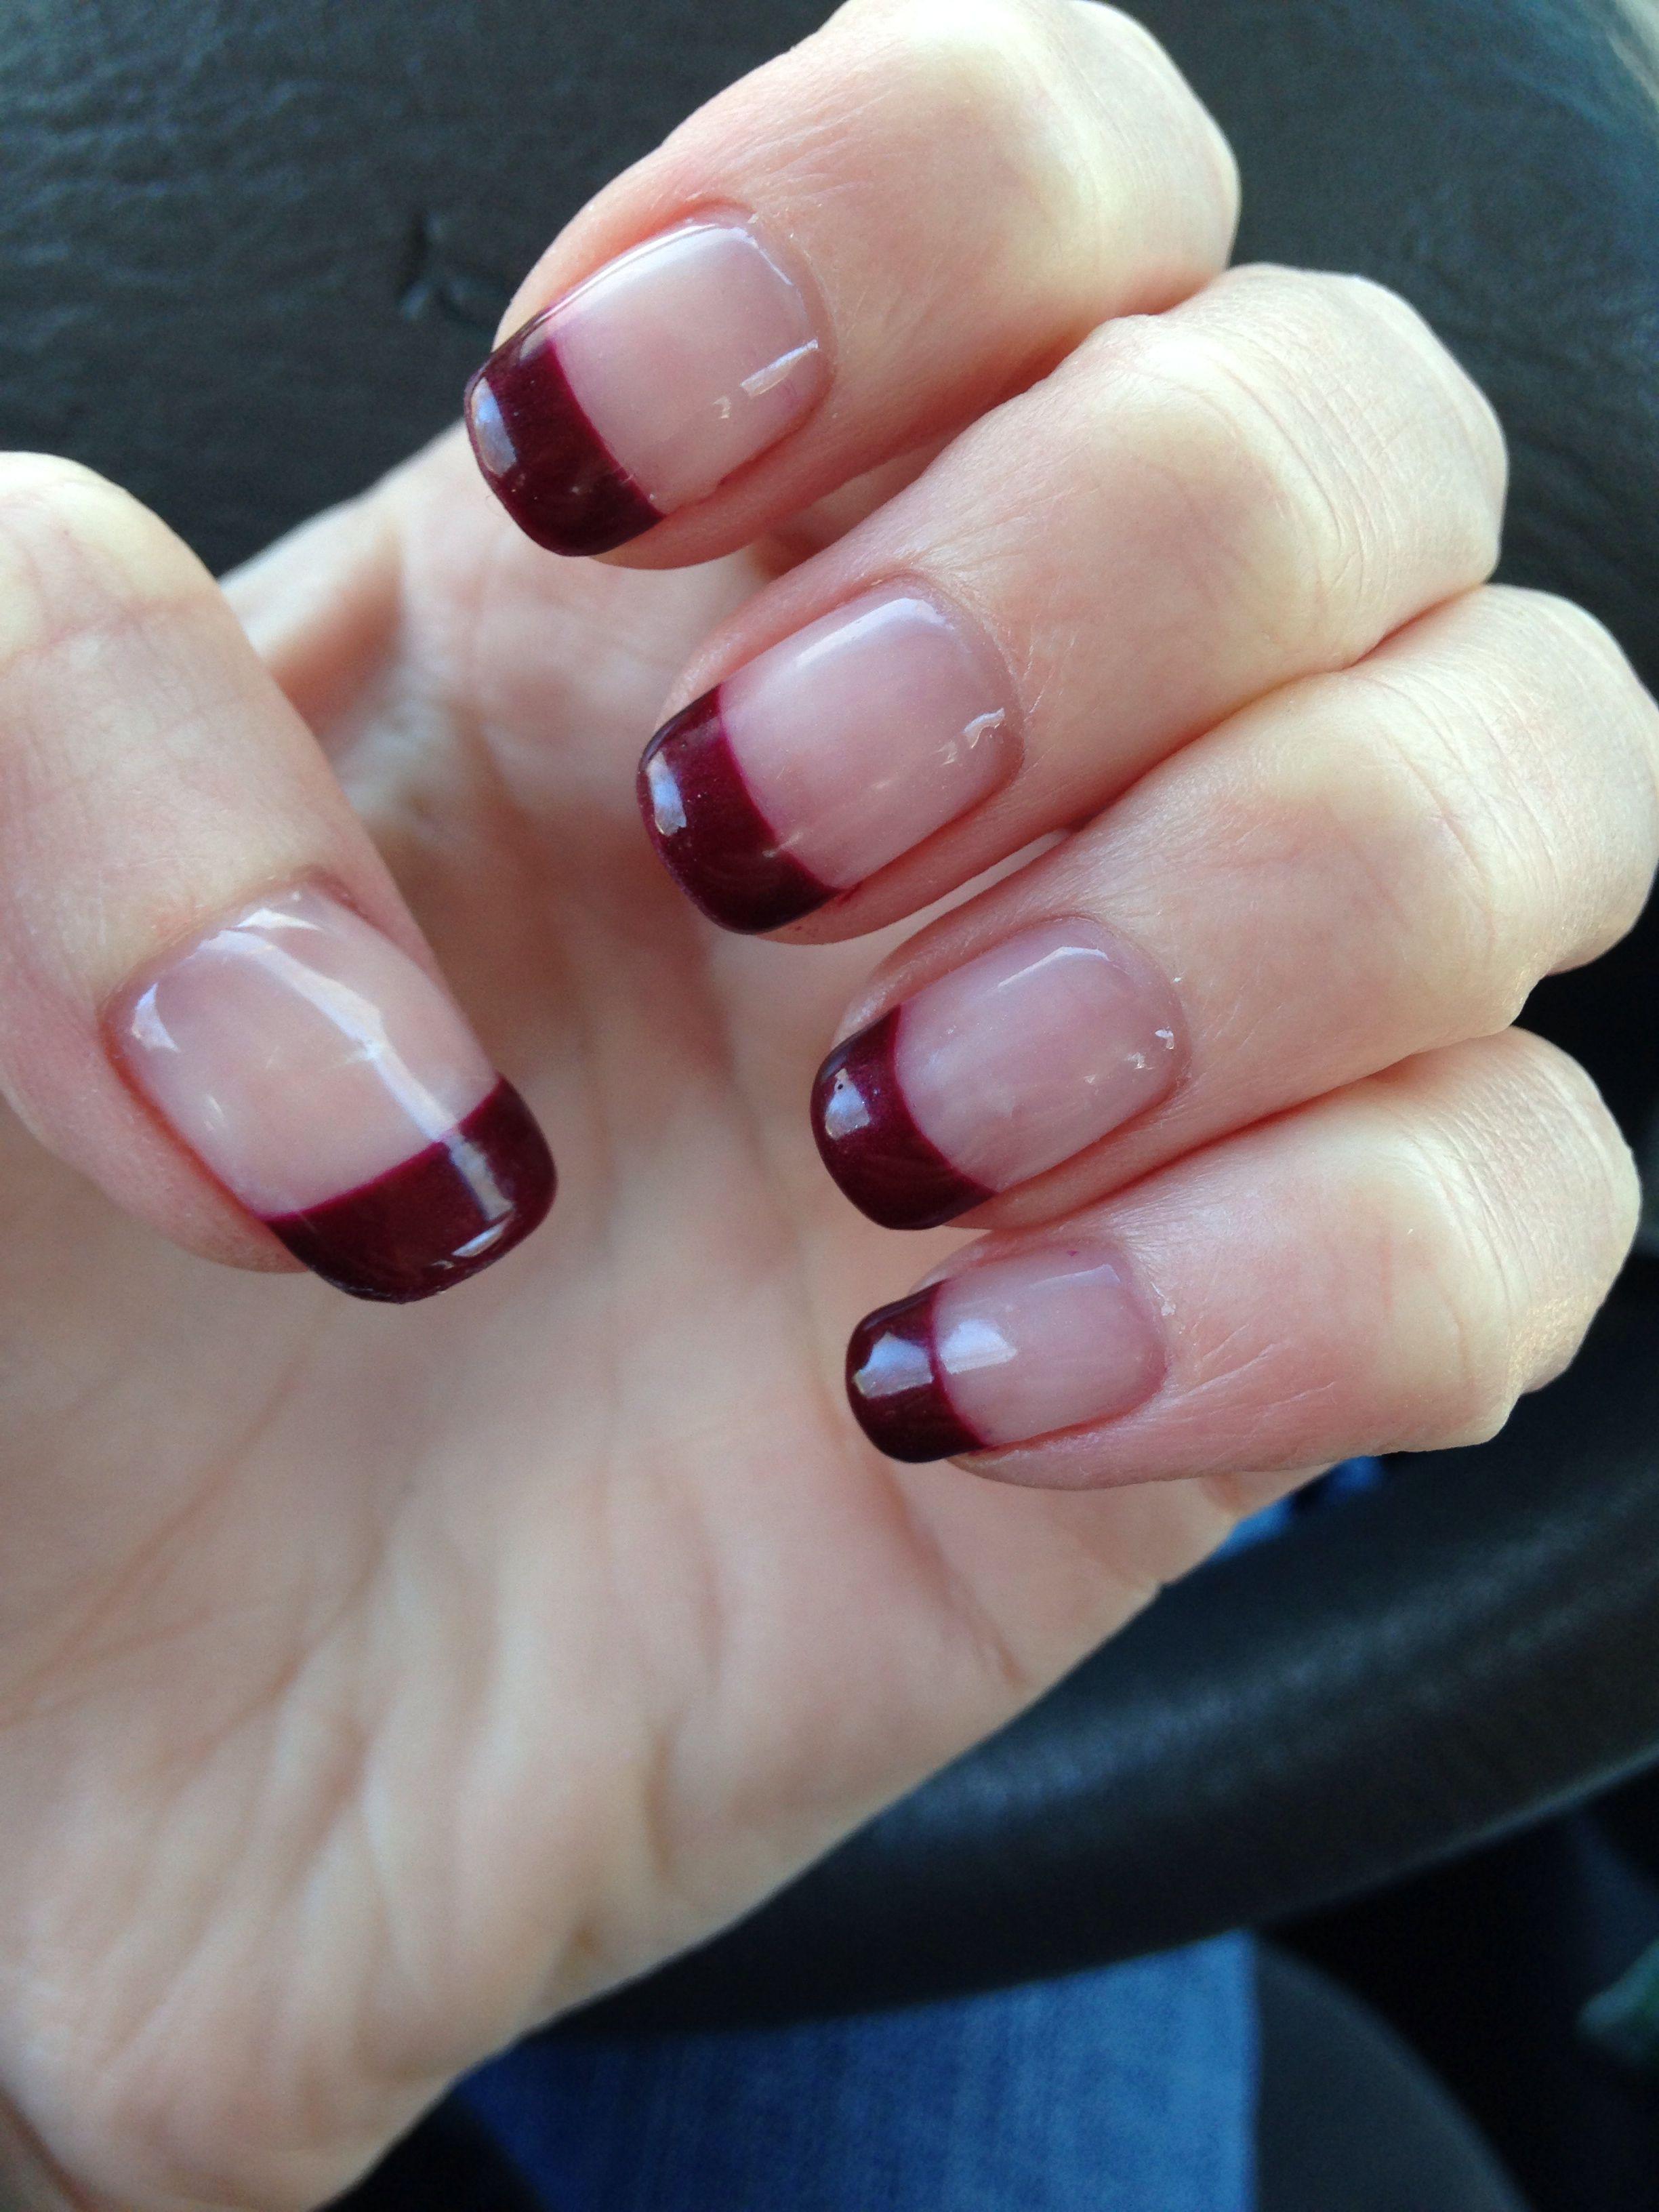 Gel Nails Berry Colored Tips Nails Nail Designs Gel Nails